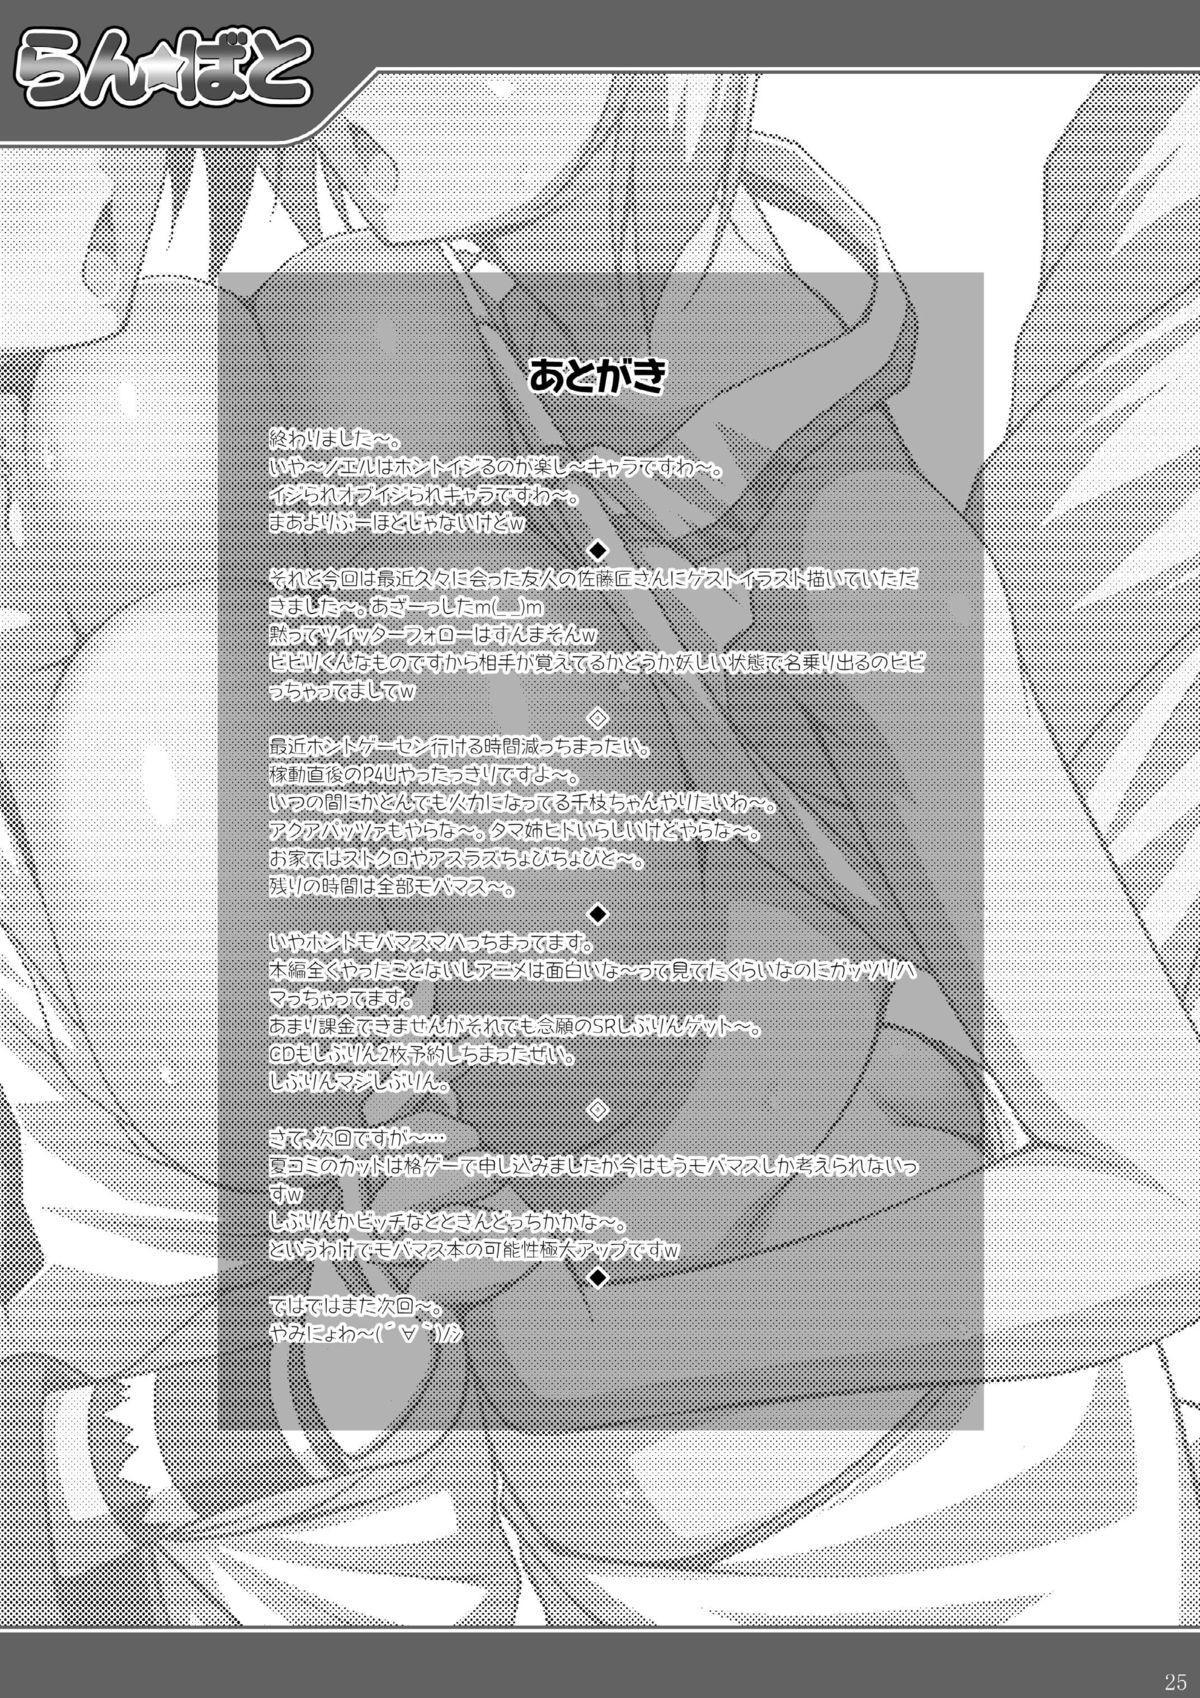 Ran ☆ Bato - Round 2 24